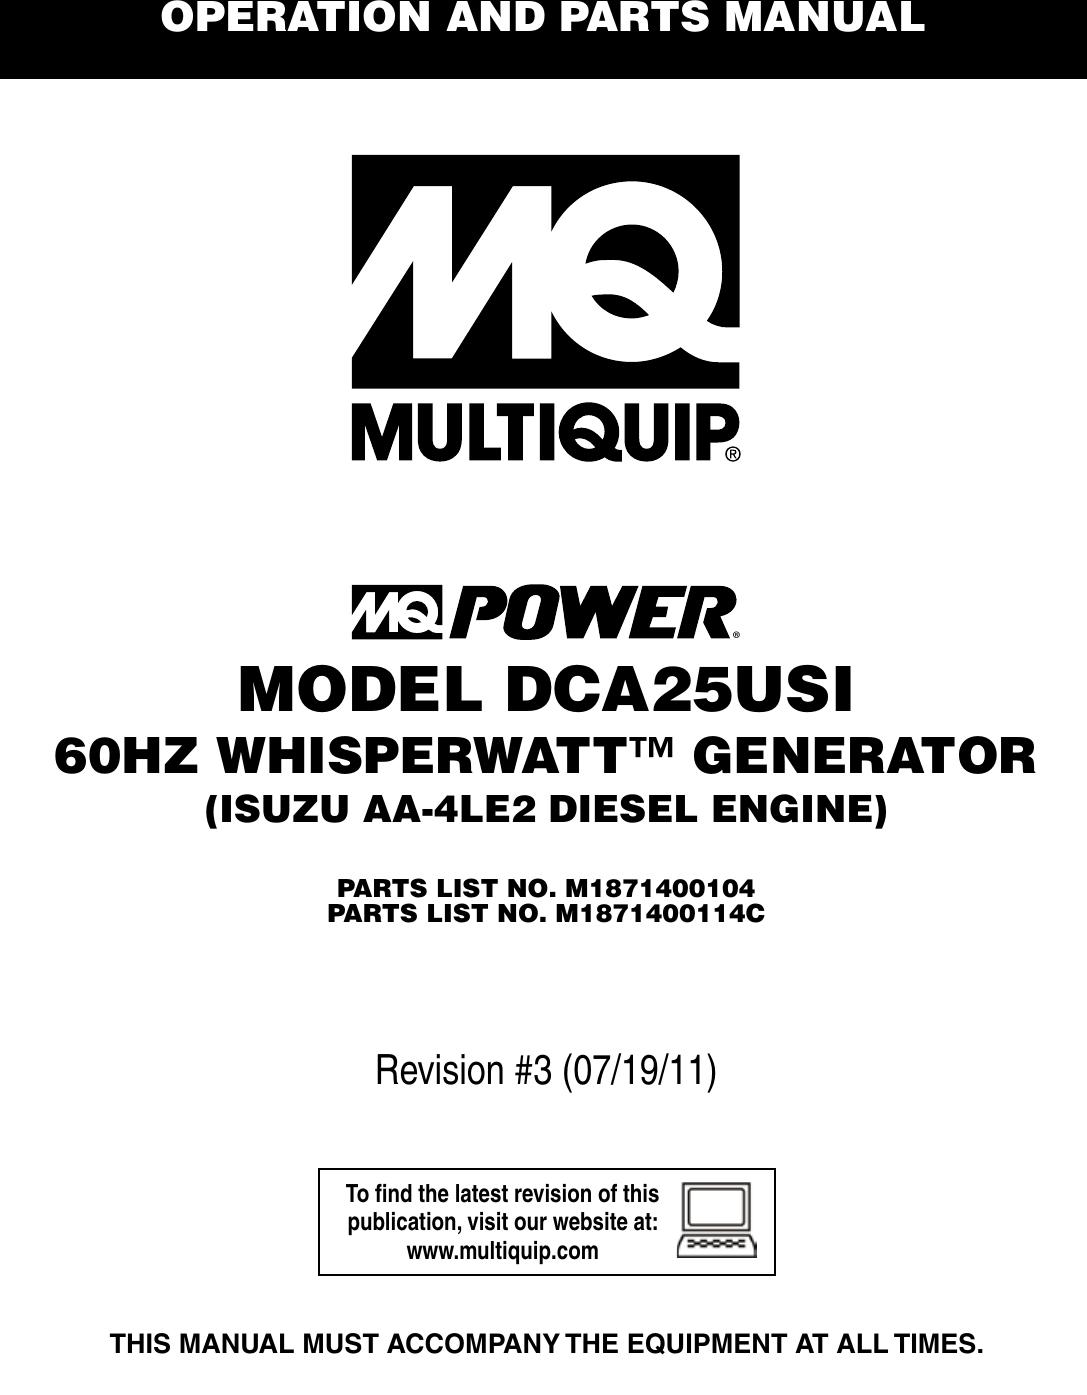 Multiquip Mq Power 60hz Whisperwatt Generator Dca25usi Users Manual Isuzu Alternator Wiring Diagram Schematic Formula